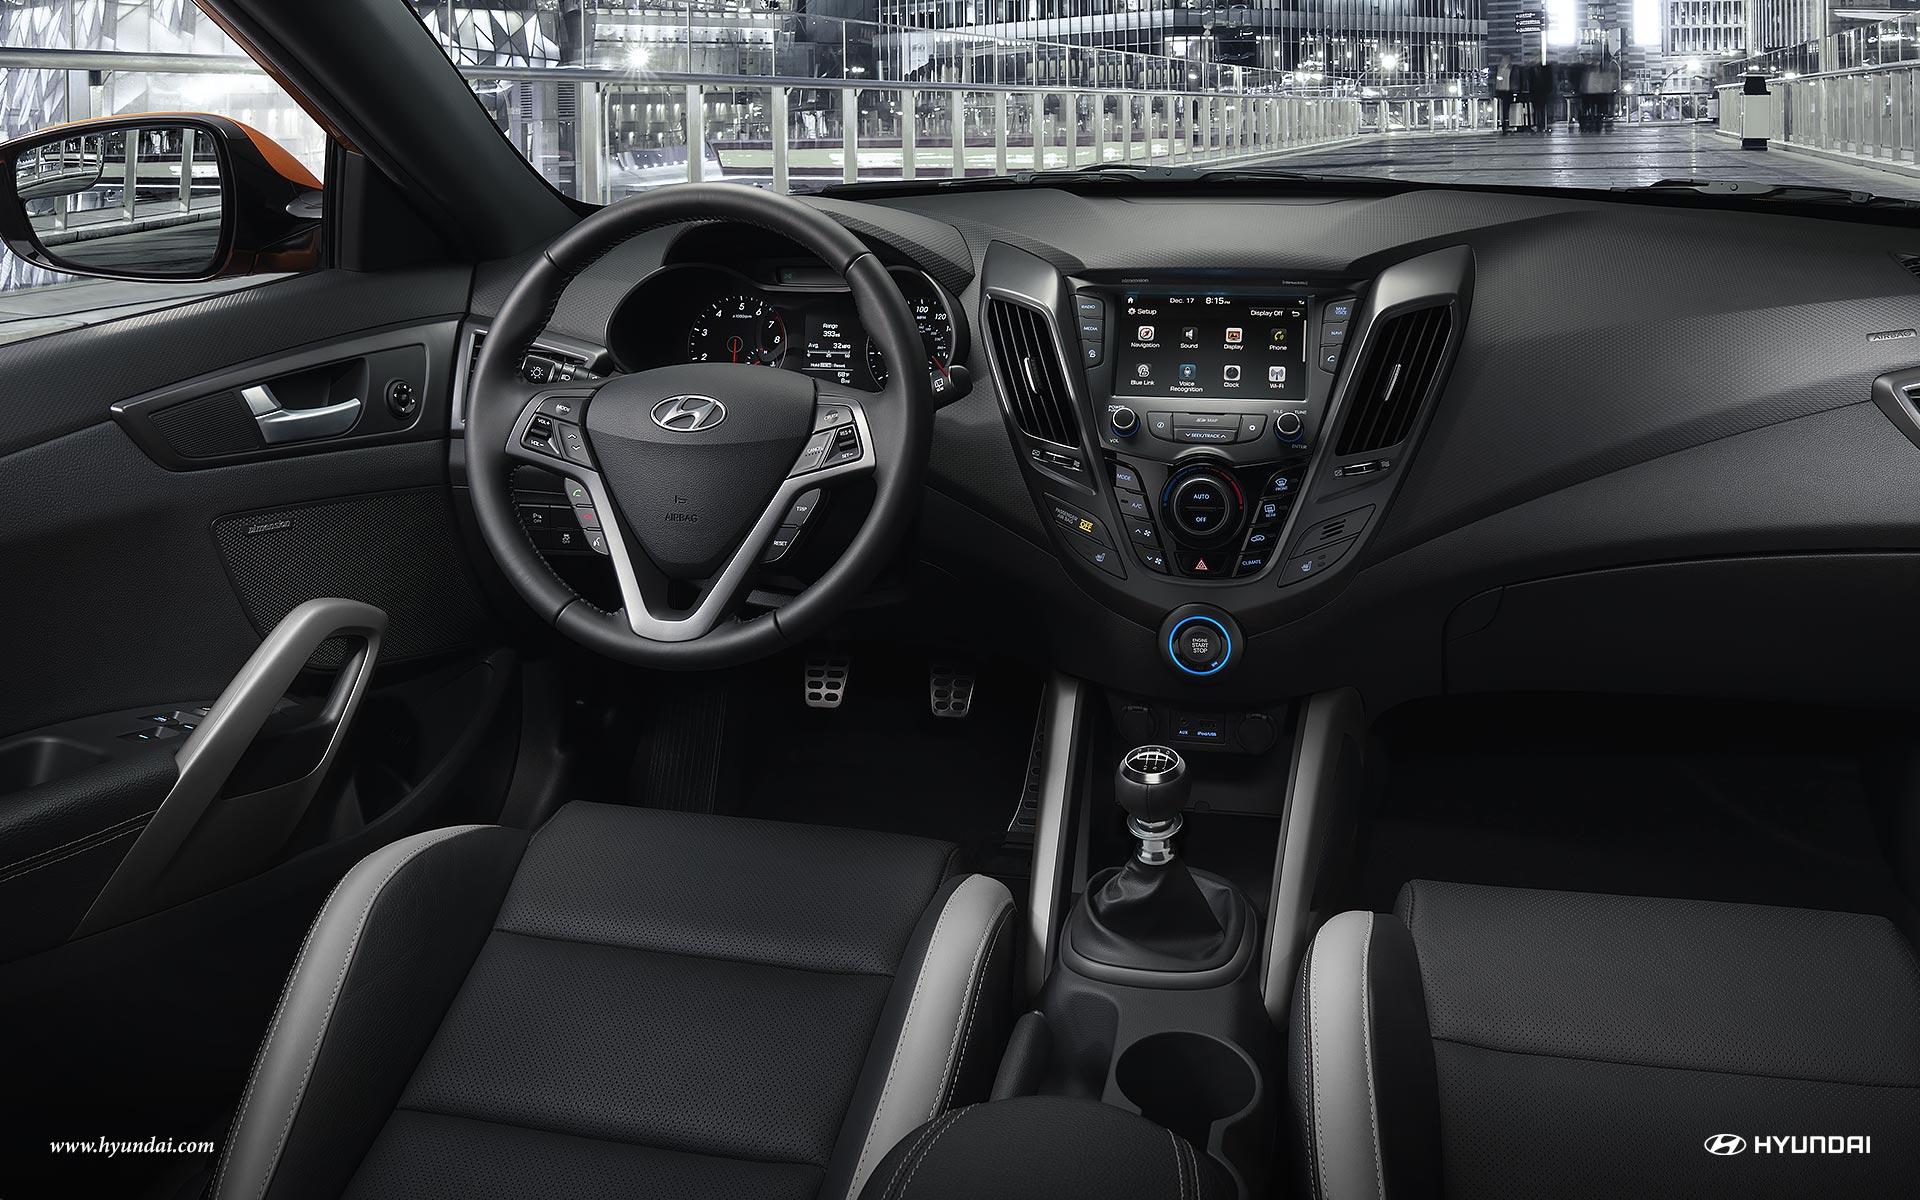 Research 2018 Hyundai Veloster Brazos Valley Hyundai Bryan Texas